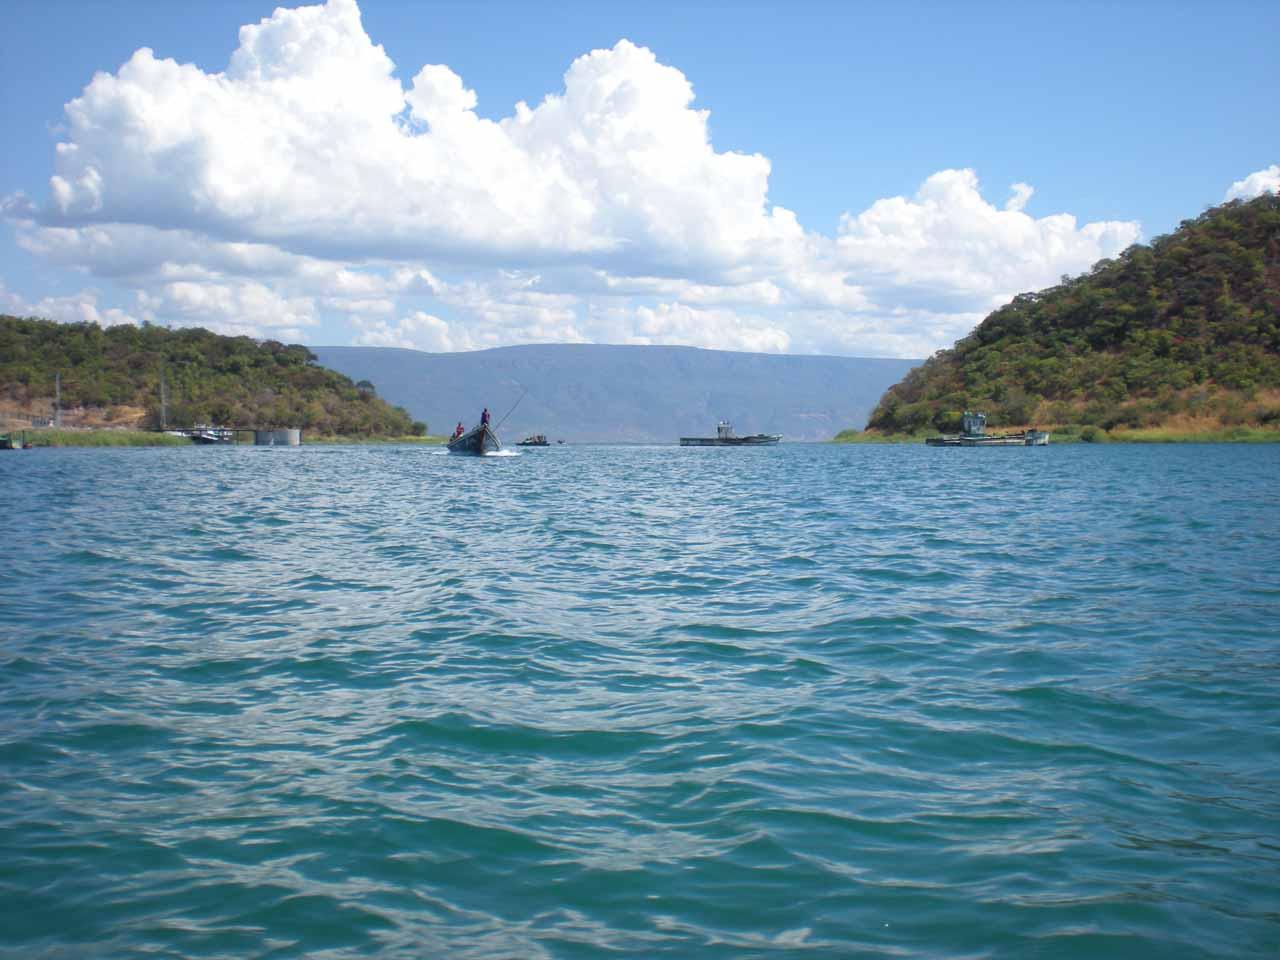 On the choppy Lake Tanganyika